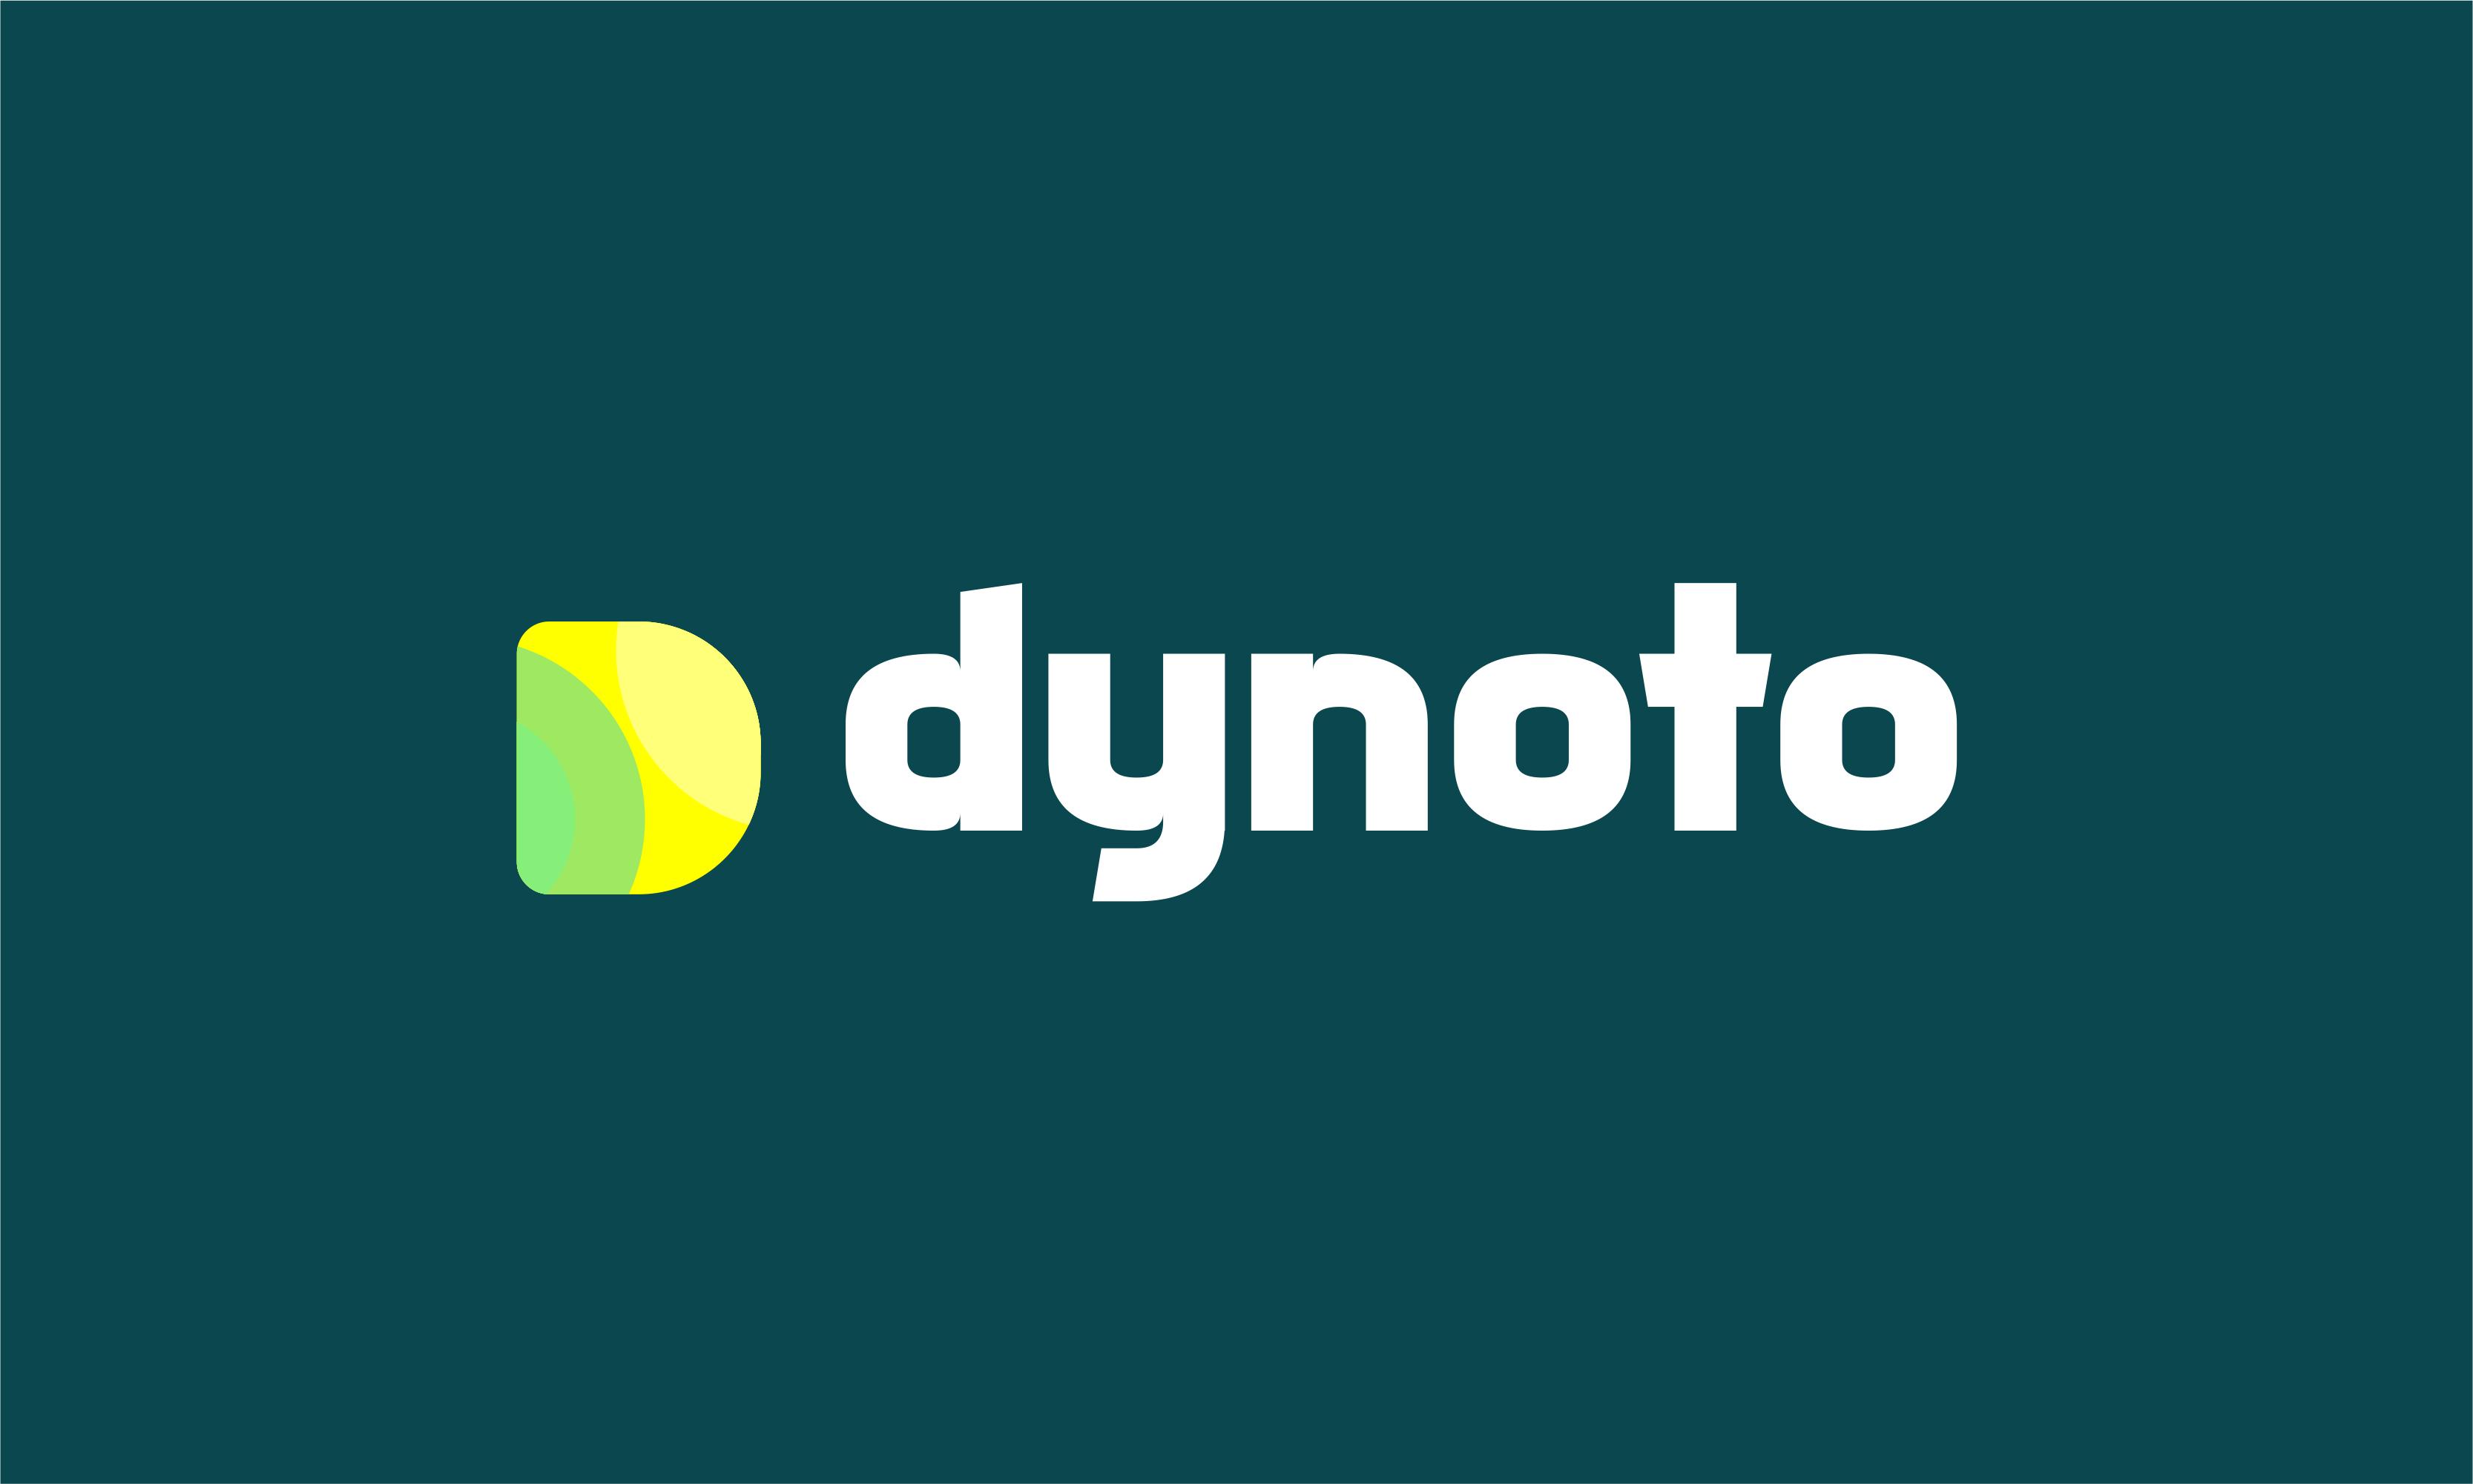 Dynoto